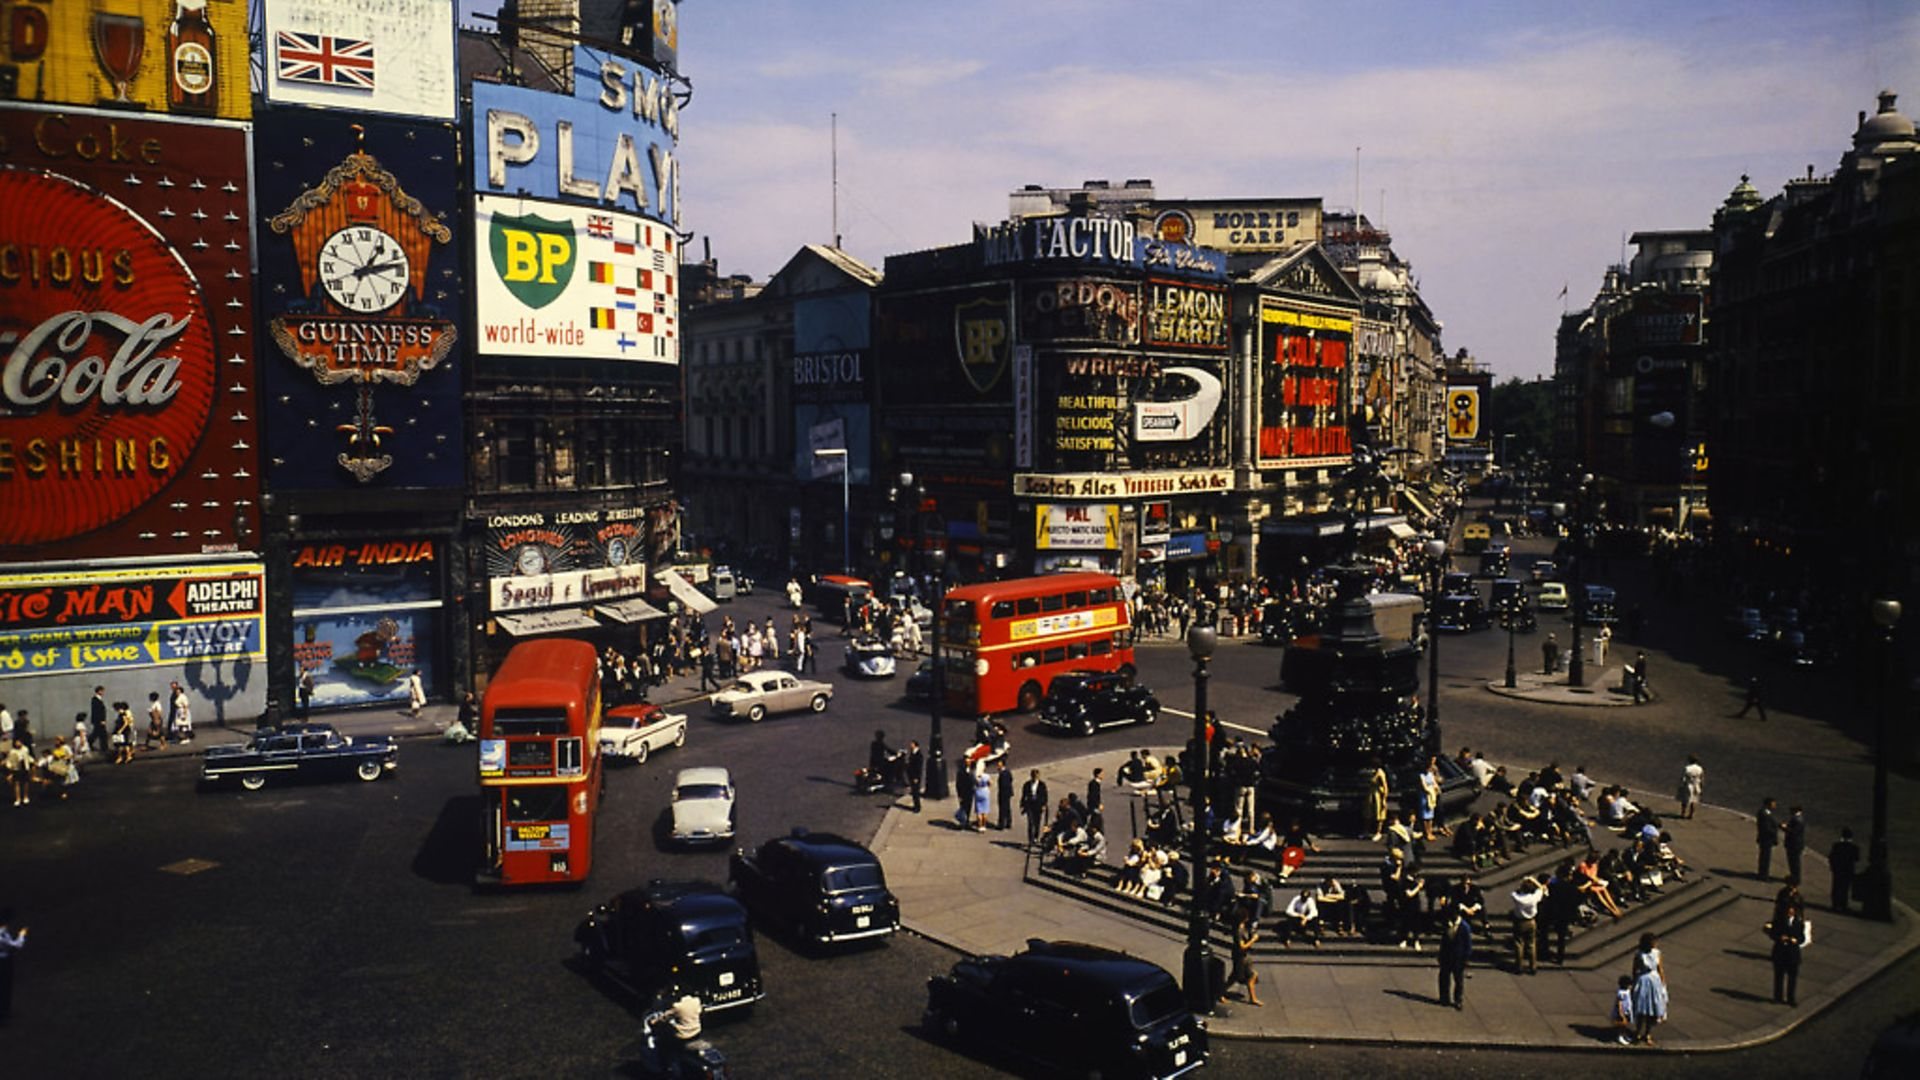 London's Piccadilly Circus, 1961. Photo: Bettmann Archive - Credit: Bettmann Archive